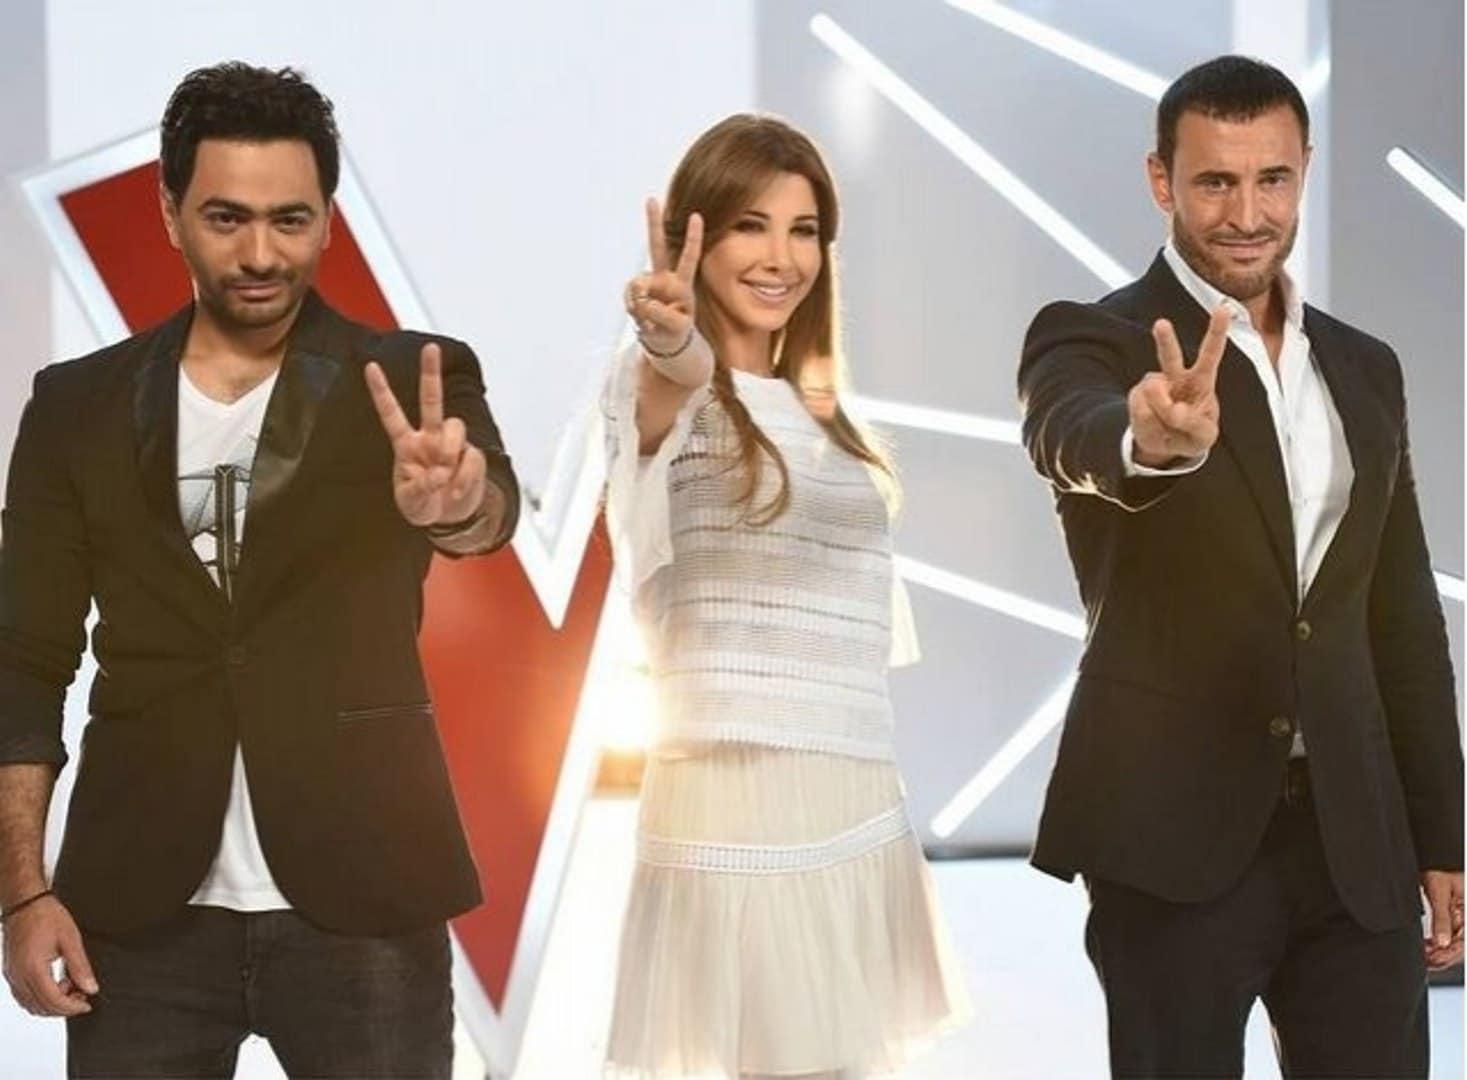 ذا فويس كيدز هل يواجه The Voice Kids فشلا بعد تغيير لجنة